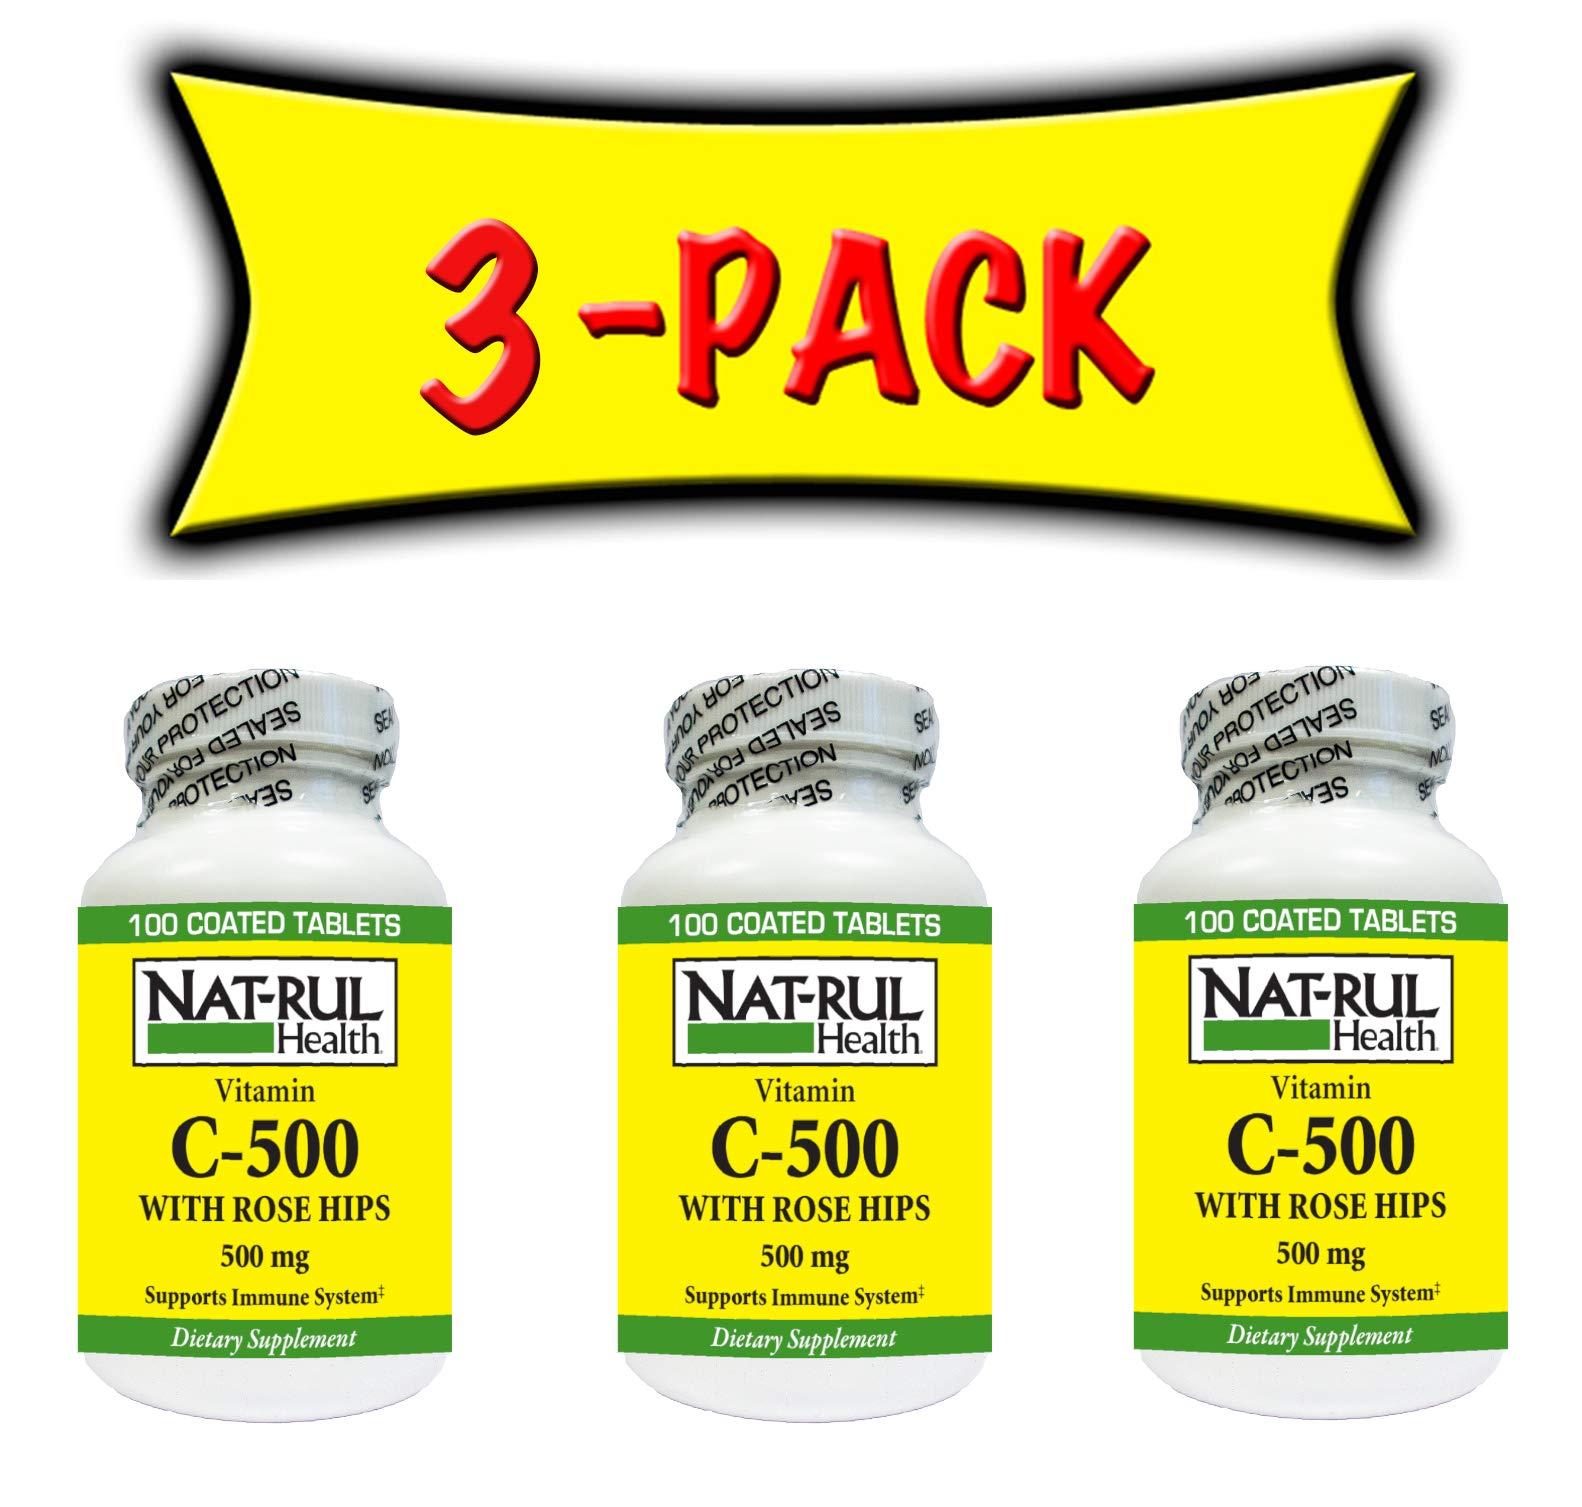 Nat-rul Health Vitamin C-500 mg Rose Hips 100 Tablets- 3 PACK